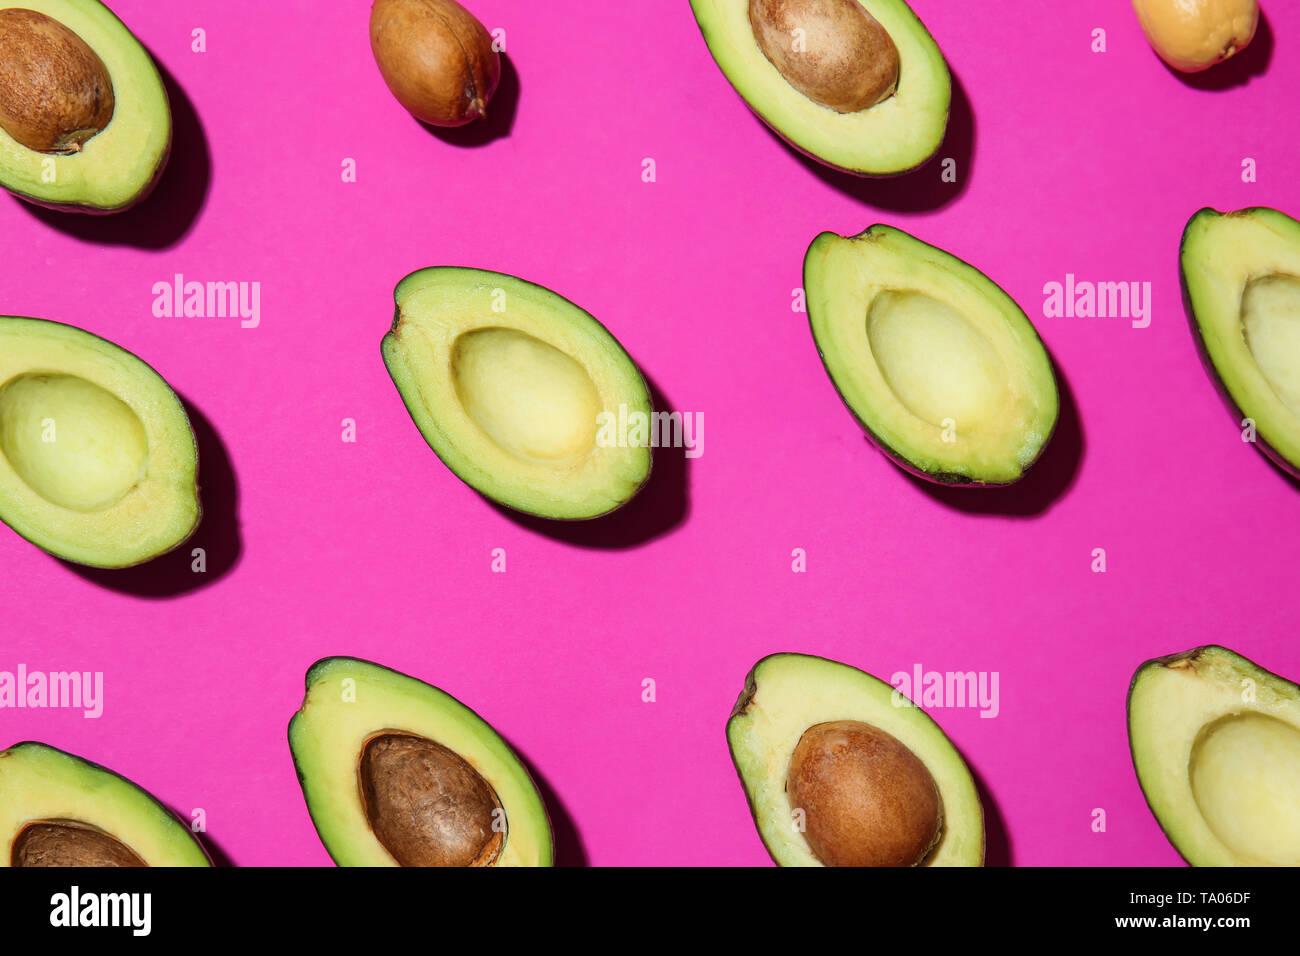 Plenty of fresh avocados on color background - Stock Image